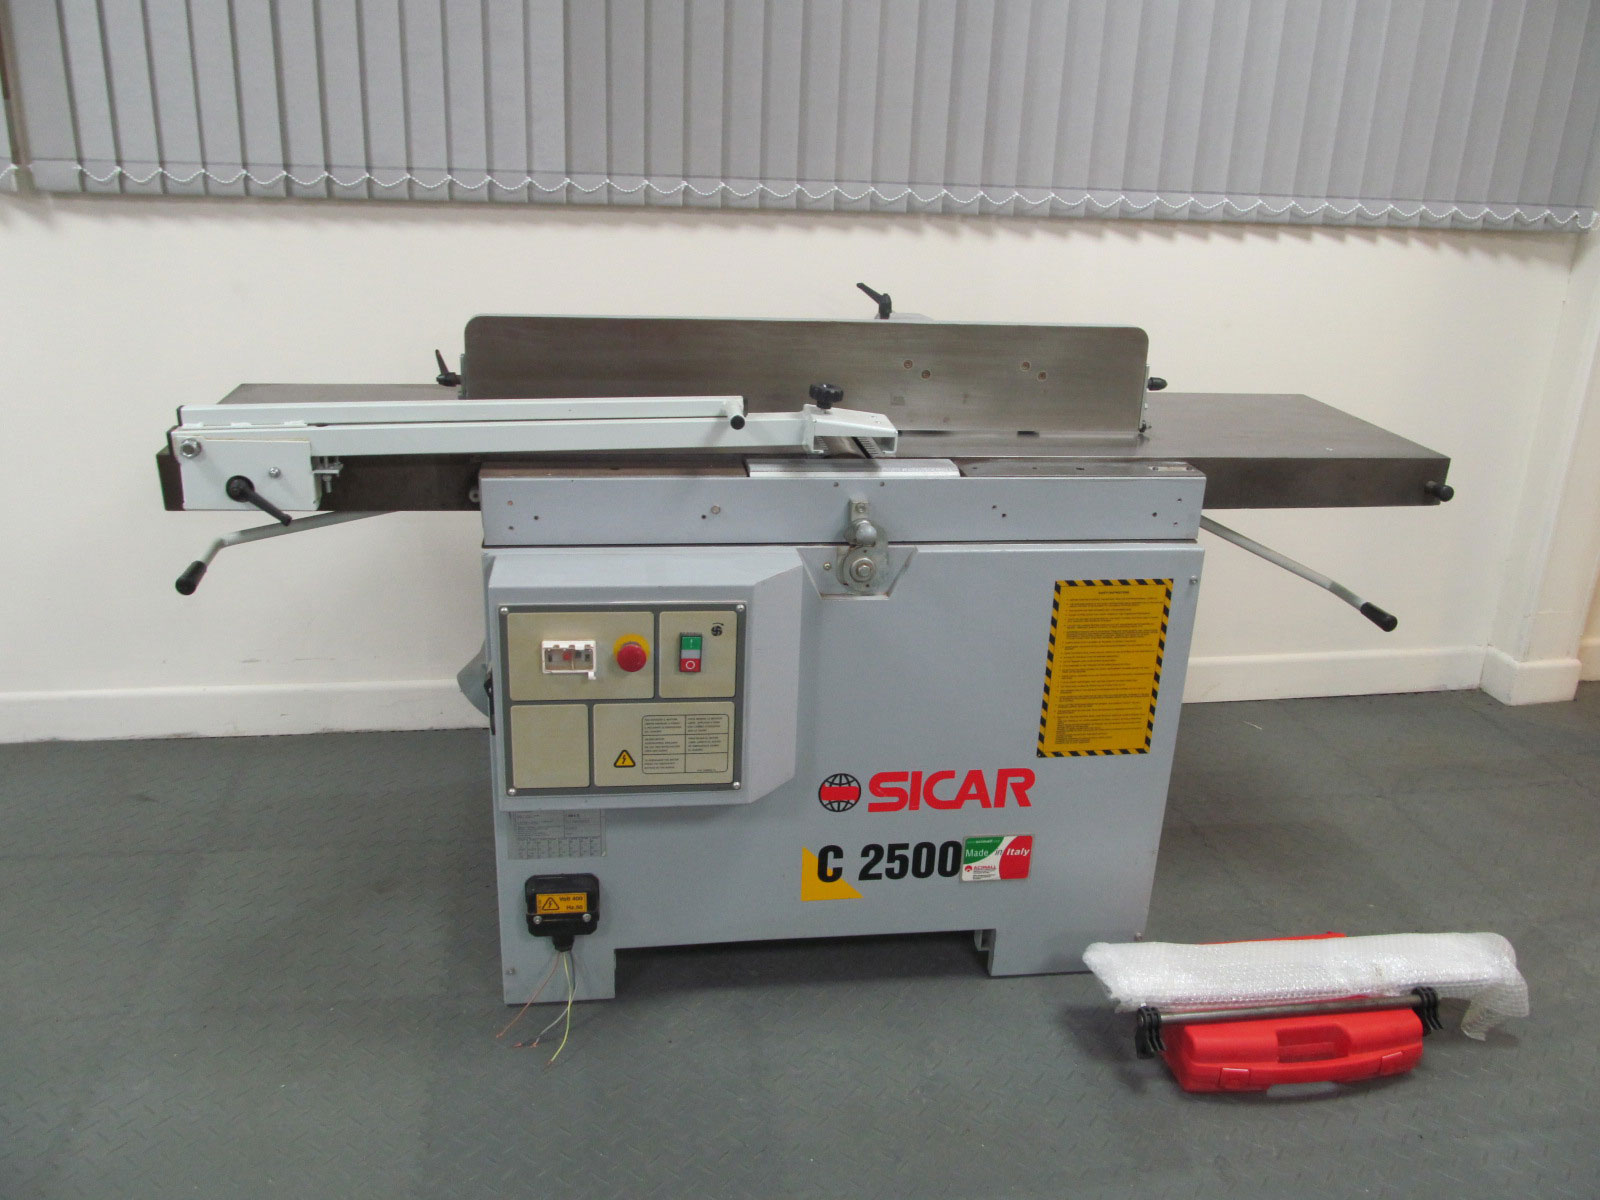 Sicar C2500 Planer thicknesser